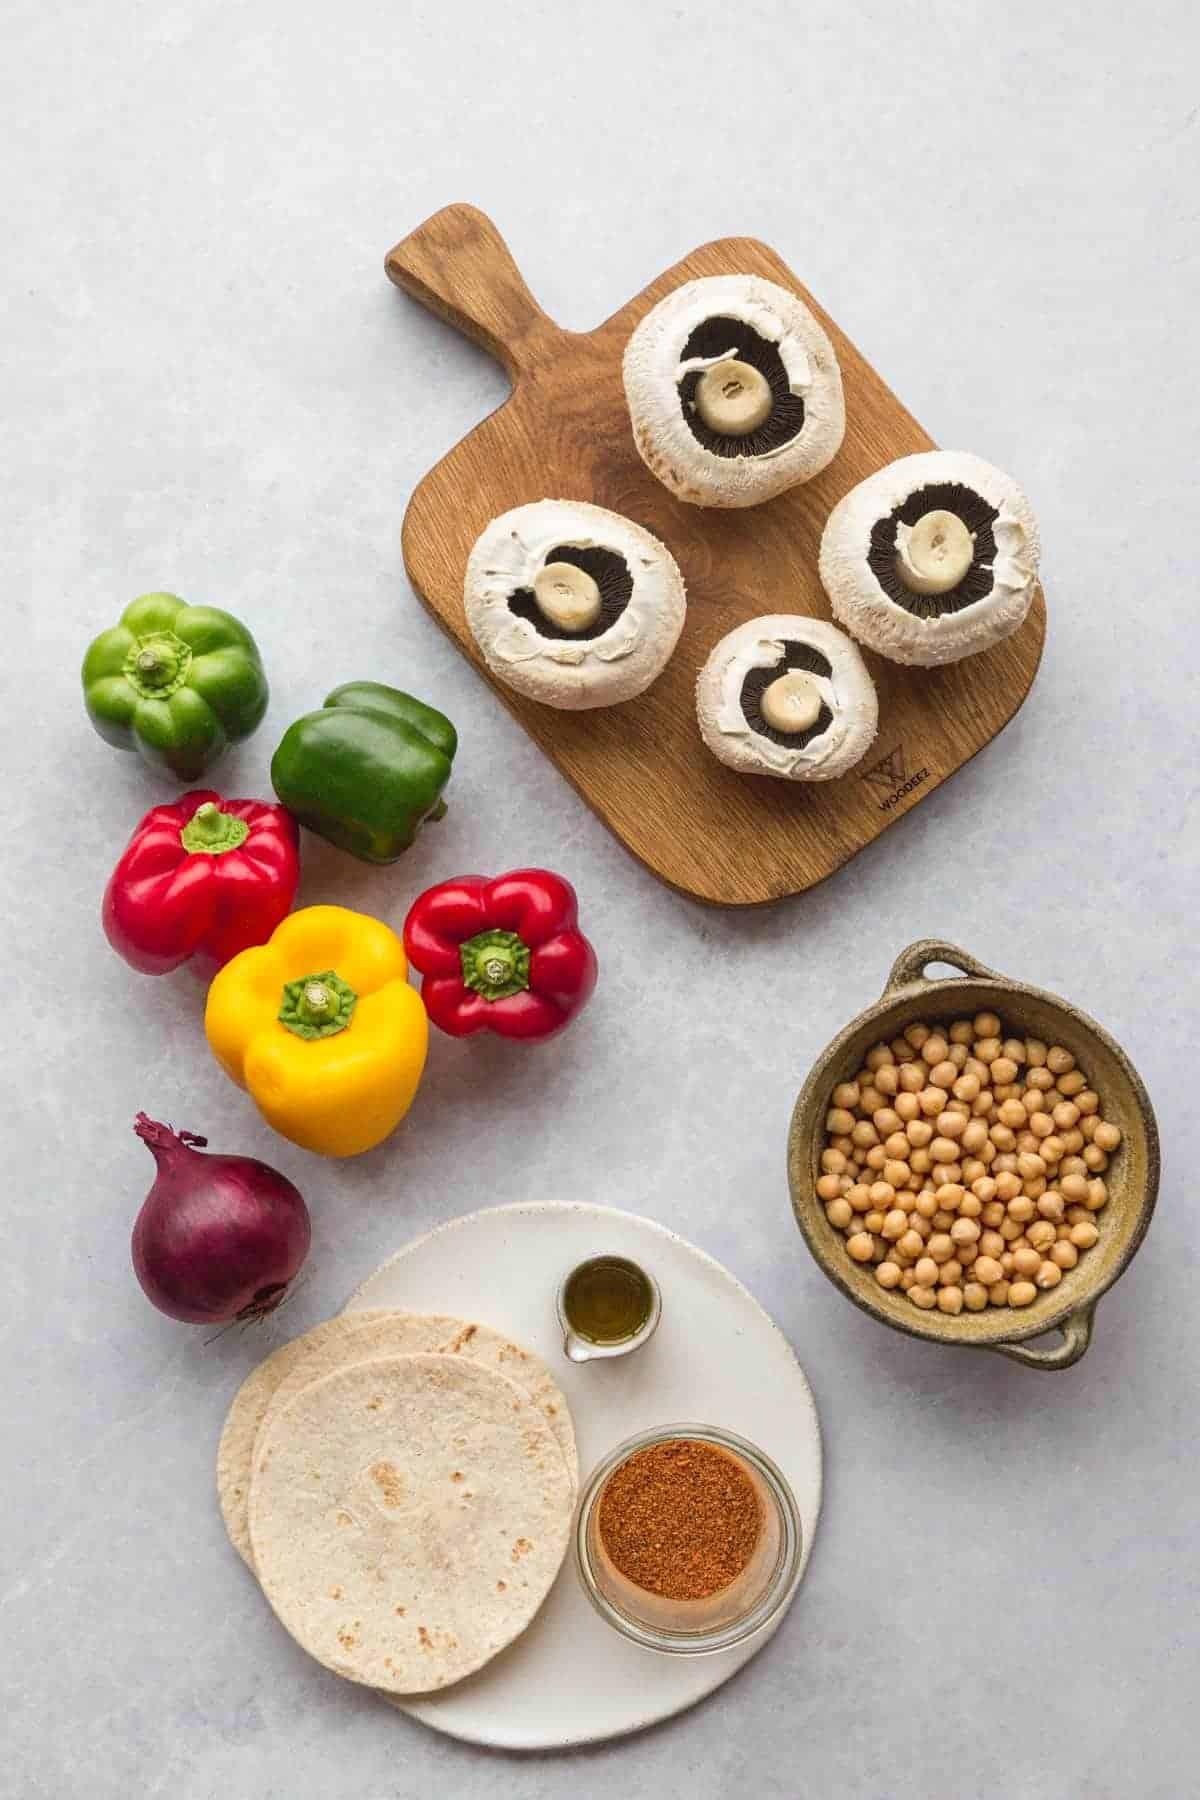 Chickpea and mushroom fajitas ingredients